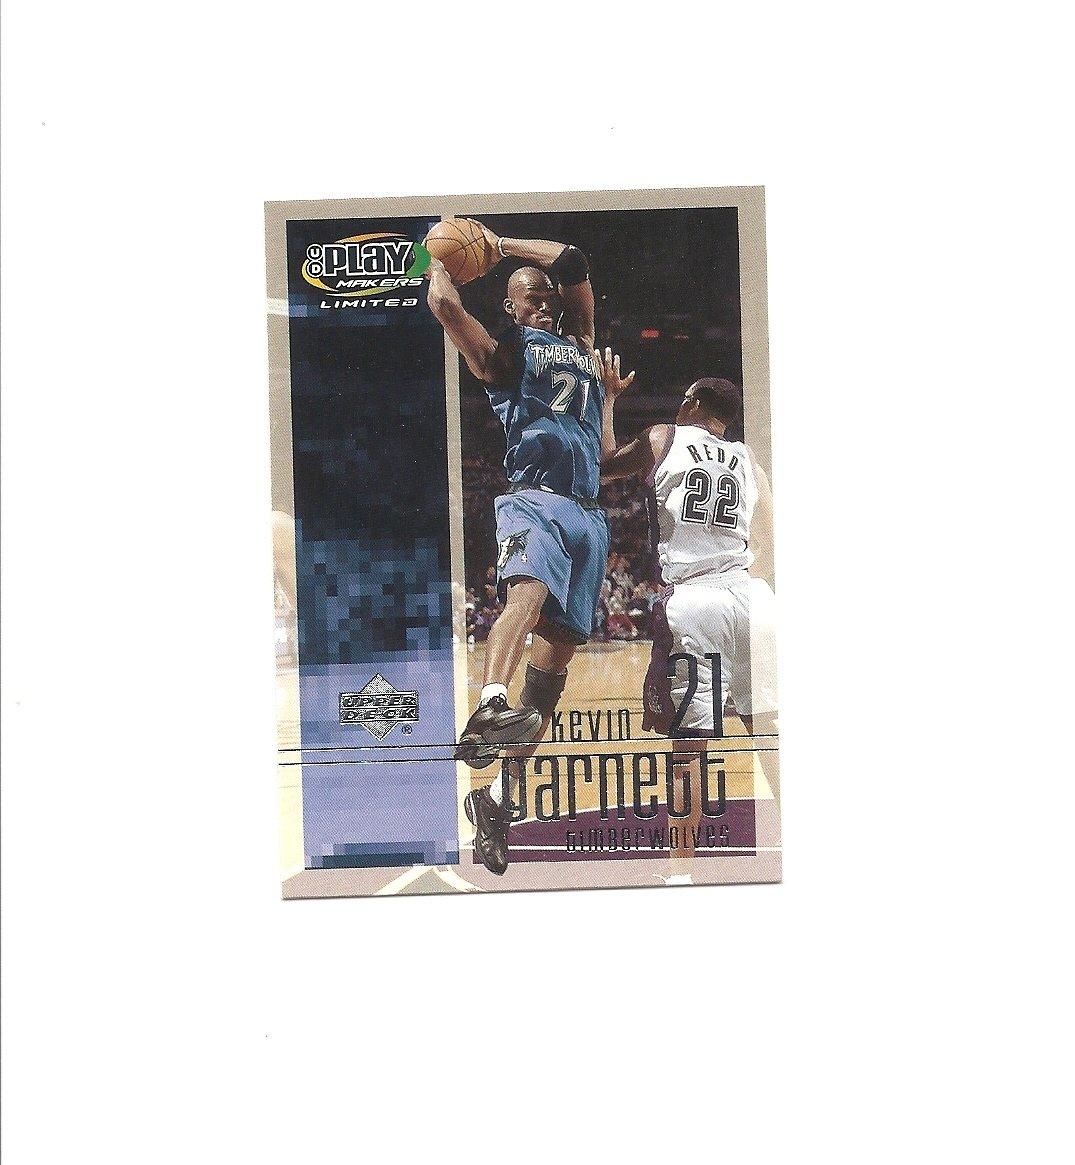 Kevin Garnett 2001-02 Upper Deck Playmakers #56 Minnesota Timberwolves/Brooklyn Nets